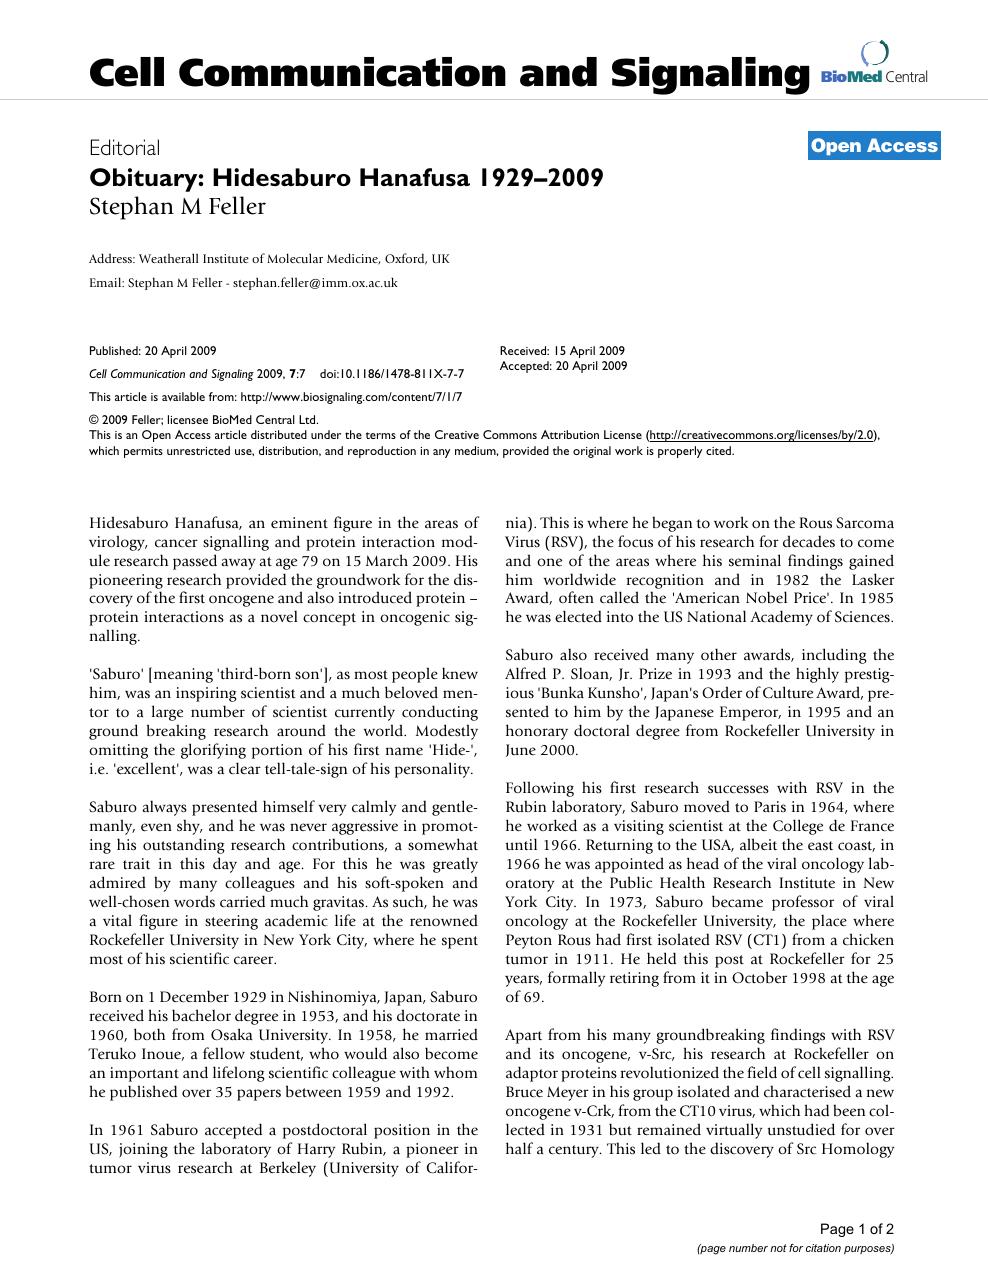 Obituary: Hidesaburo Hanafusa 1929–2009 – topic of research